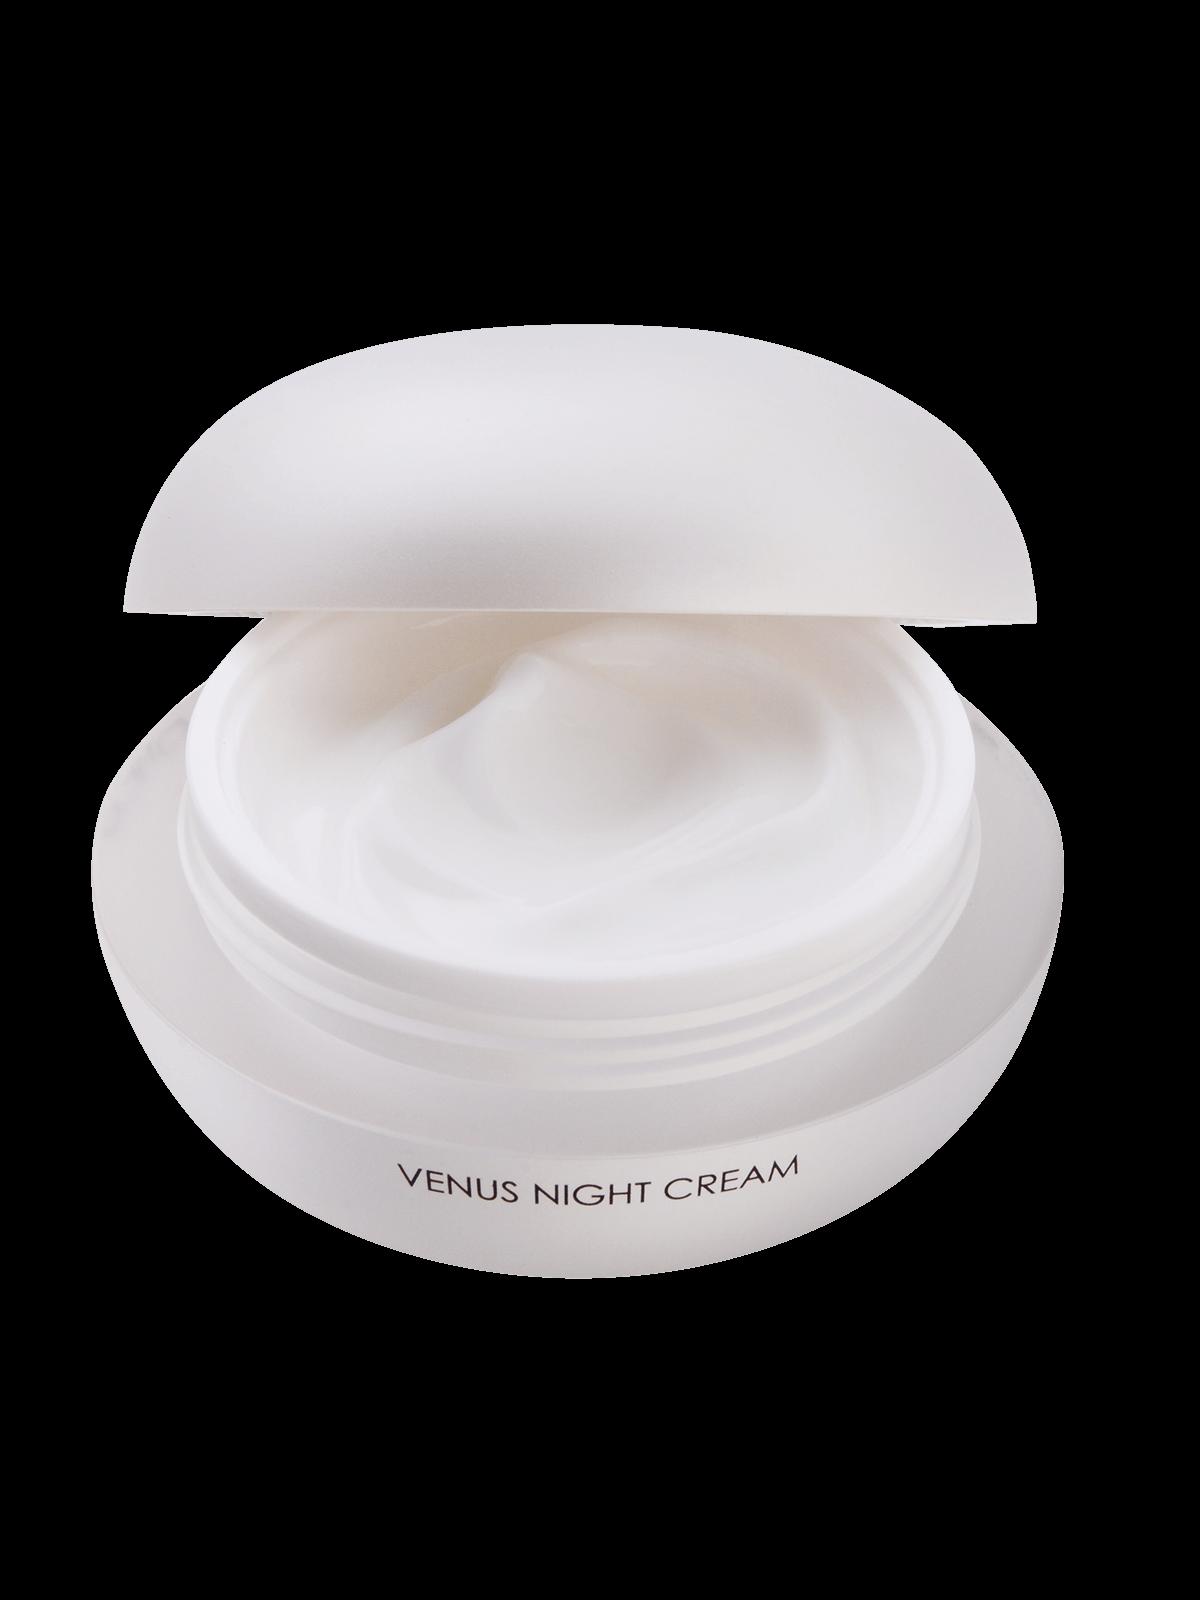 Venus Night Cream with open lid